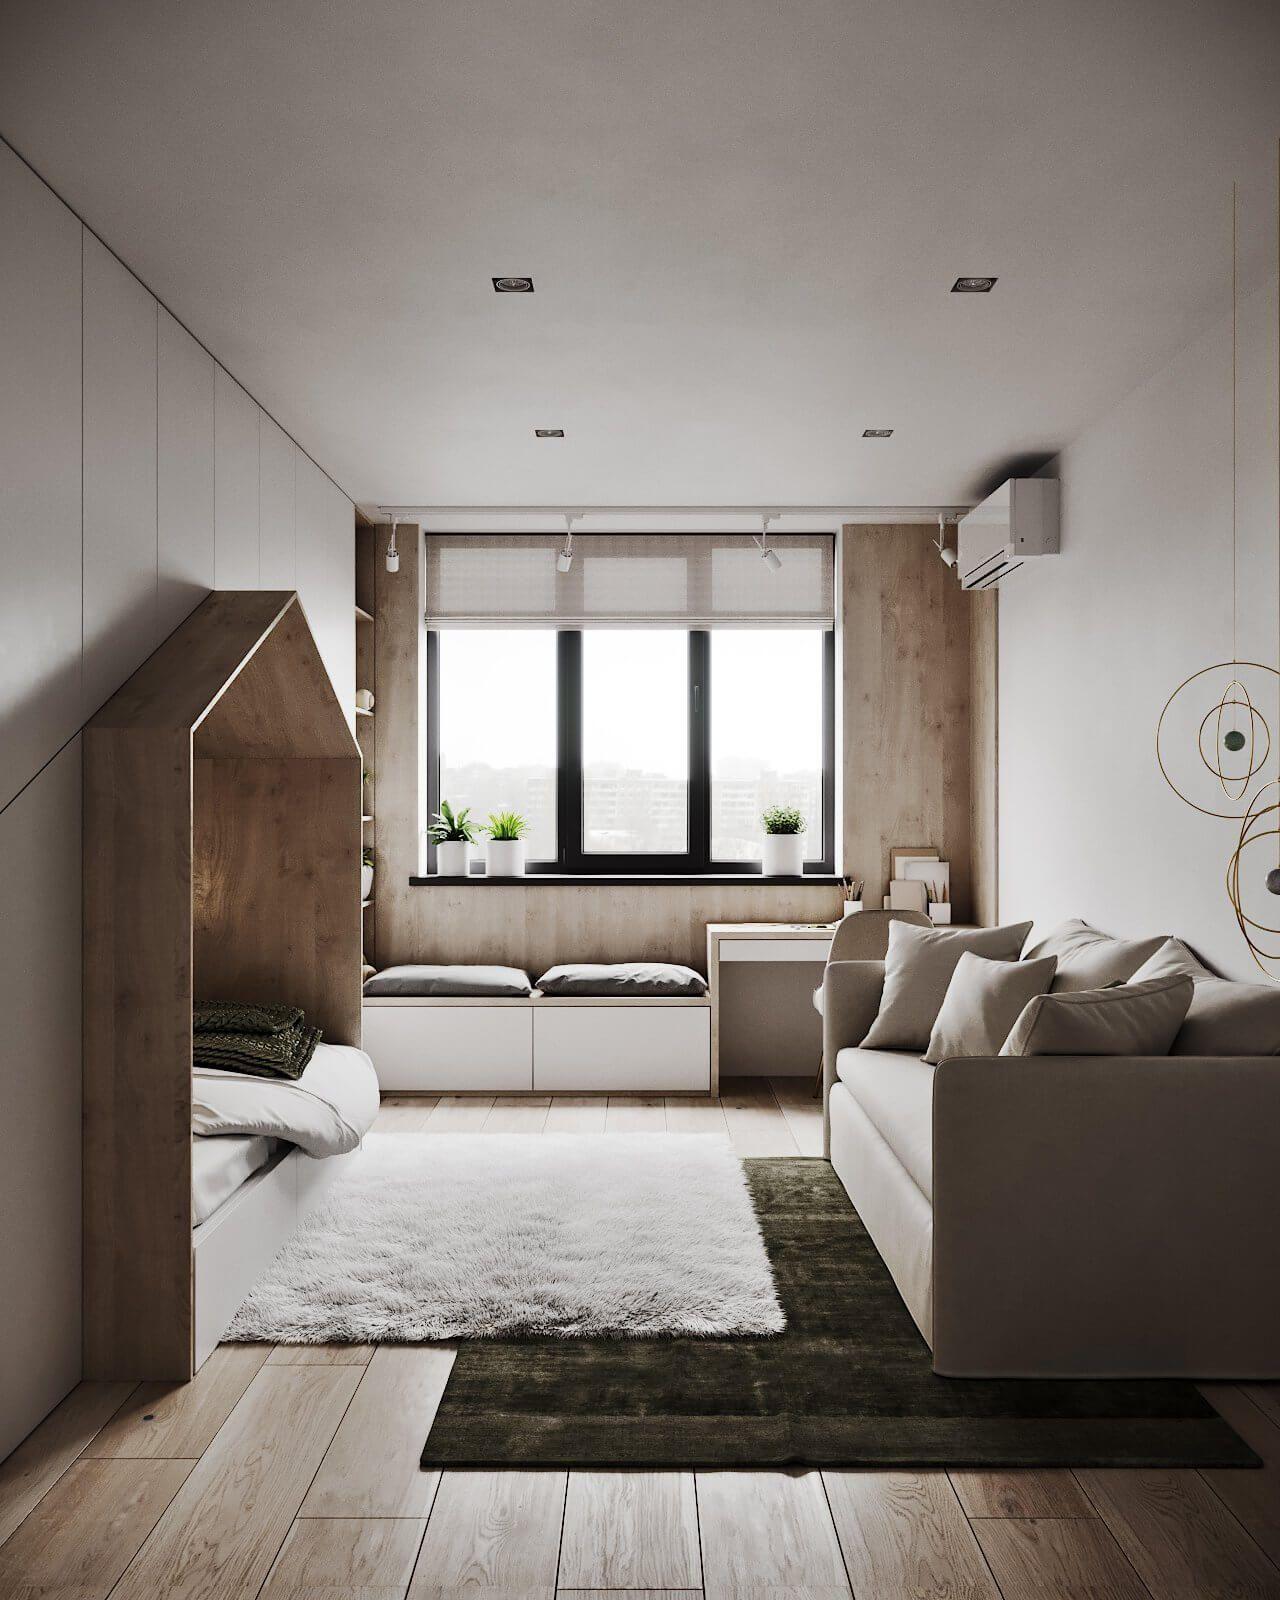 Autodesk Room Design: Modern Tenderness Flat // Cgi Visualization